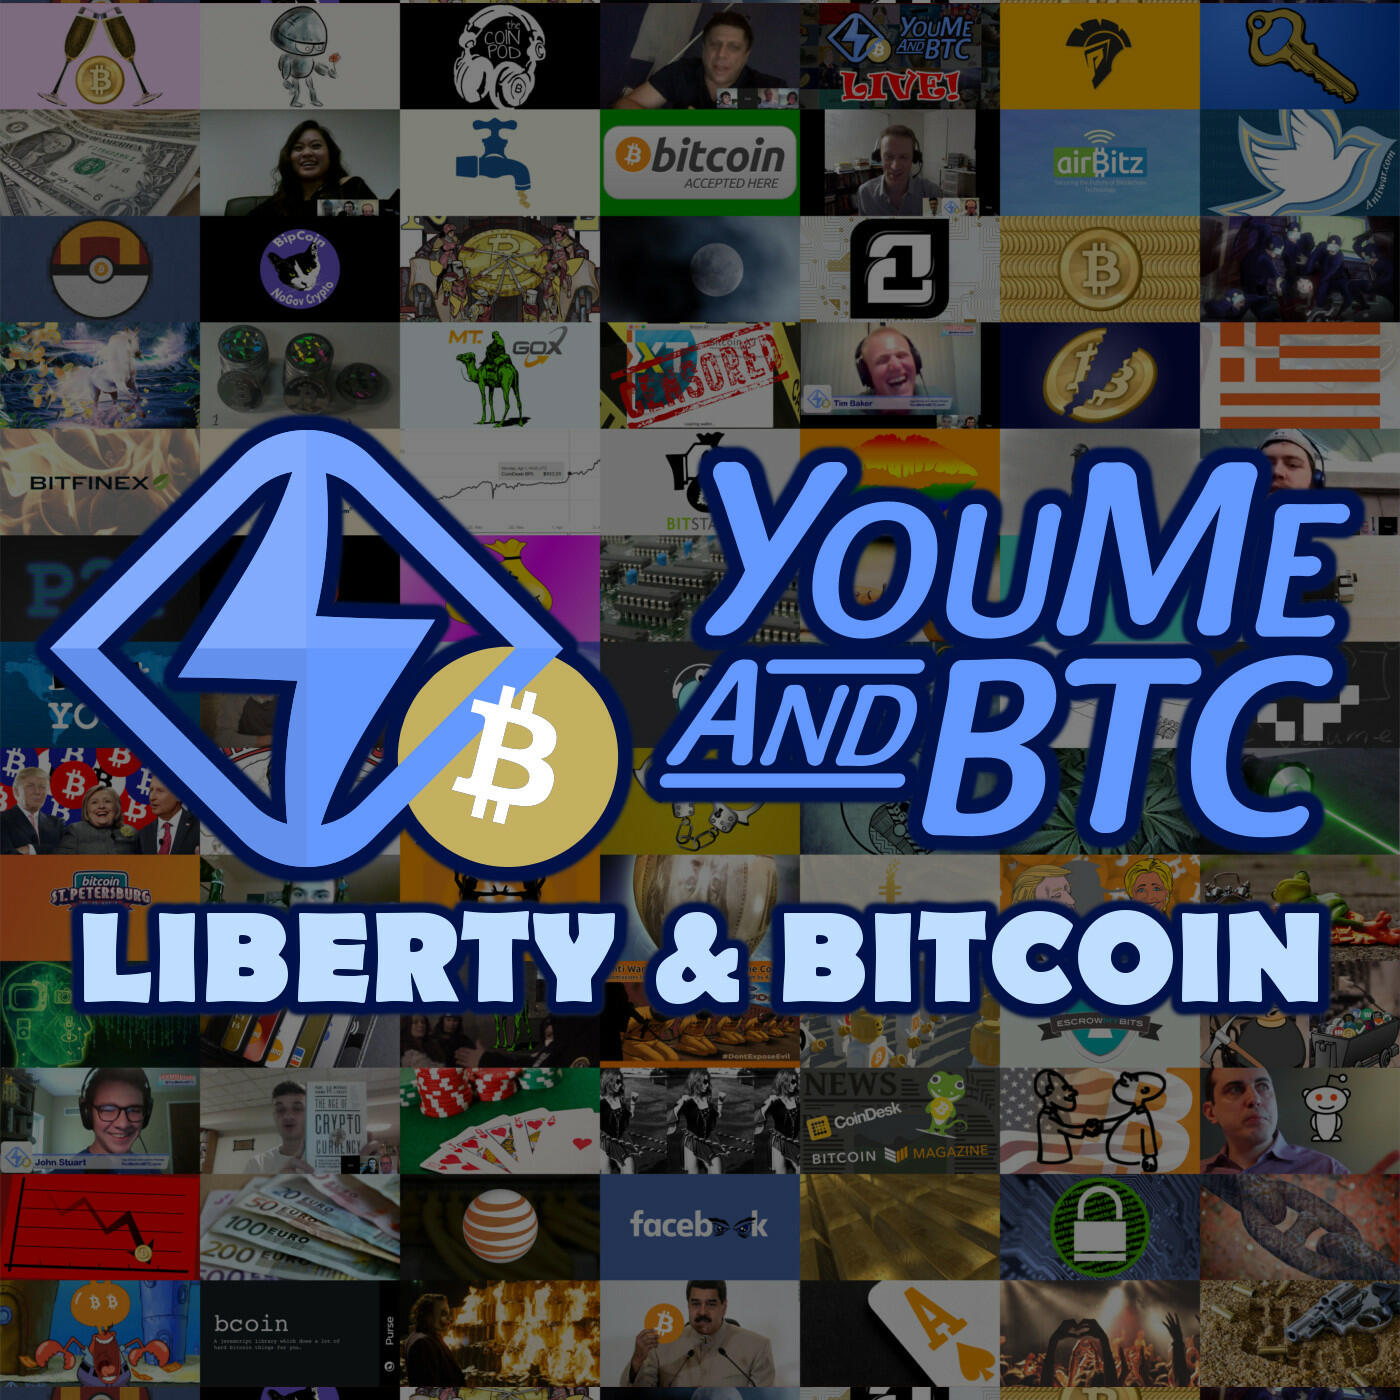 You, Me, and BTC: Liberty & Bitcoin